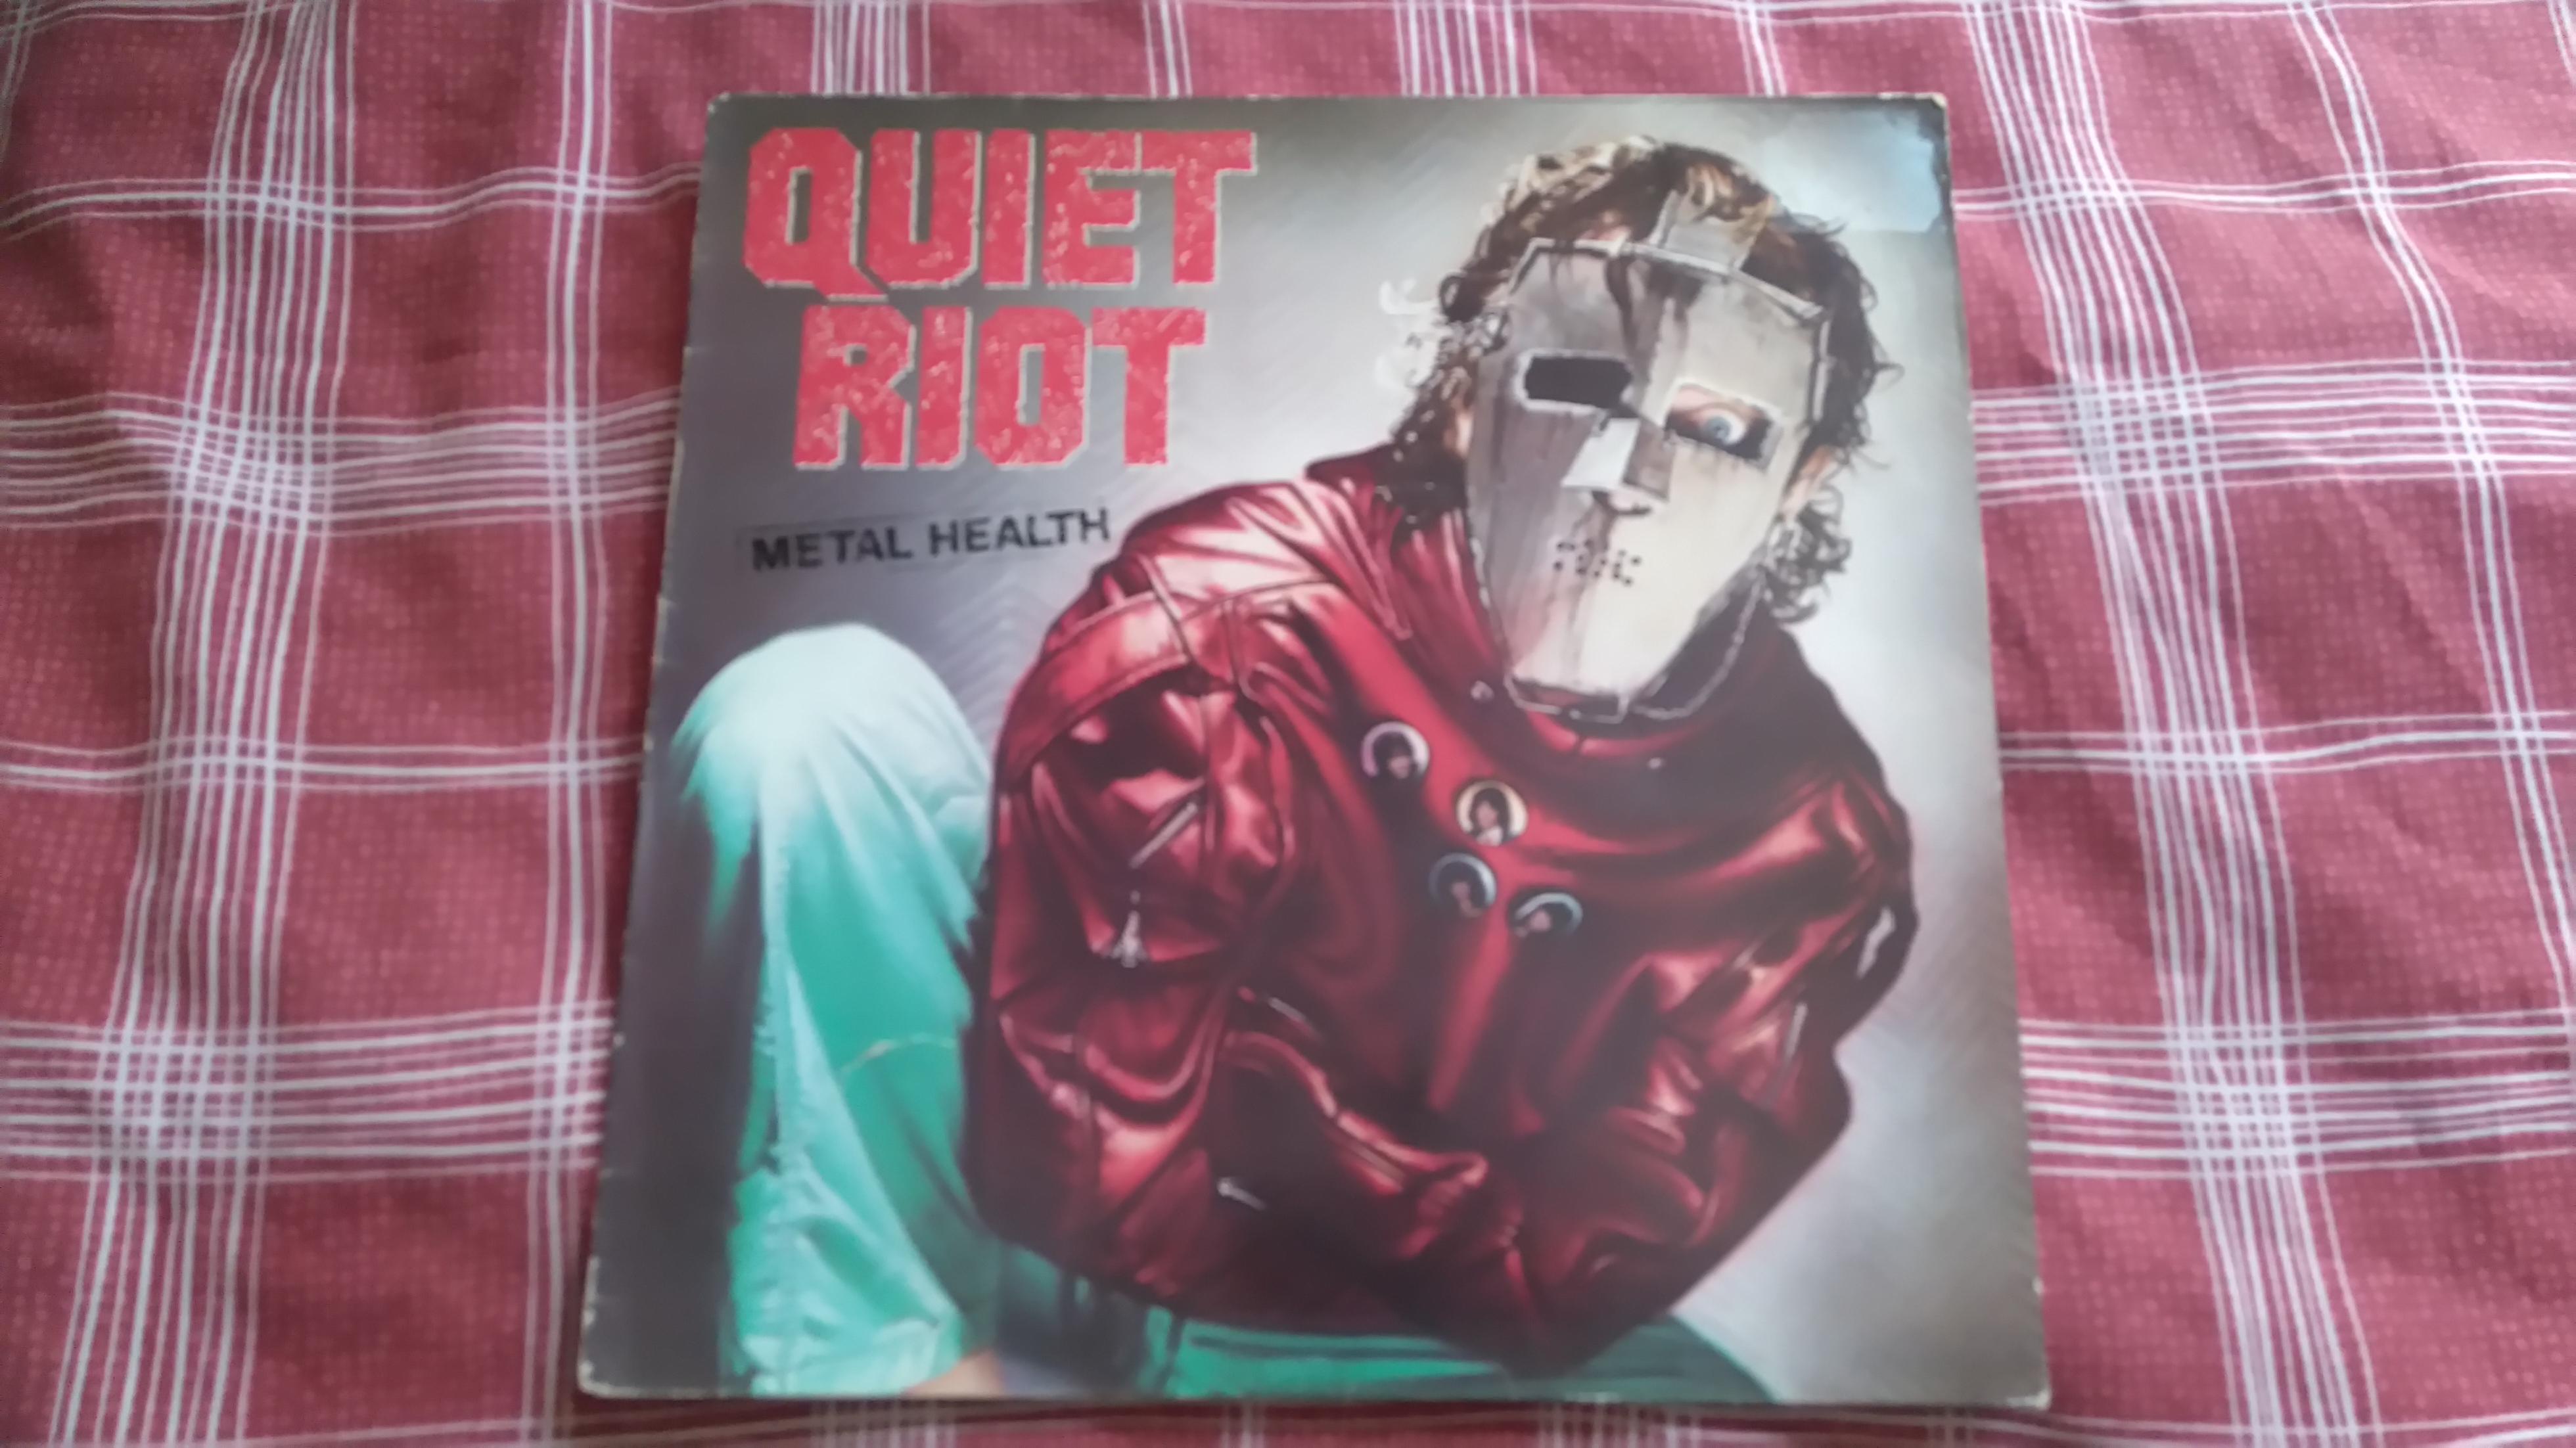 Quiet Riot Vinyl.JPG